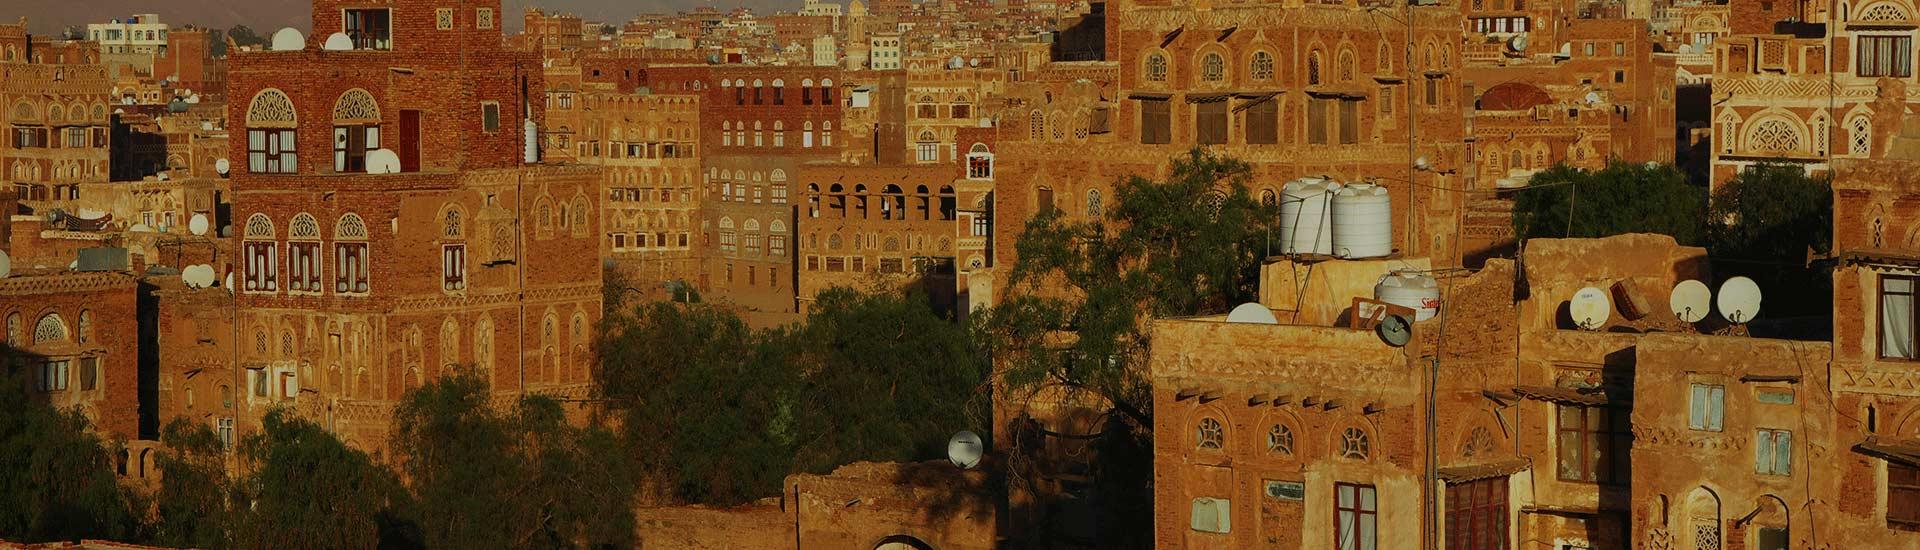 Spedition-Logistik-Unternehmen-Jemen